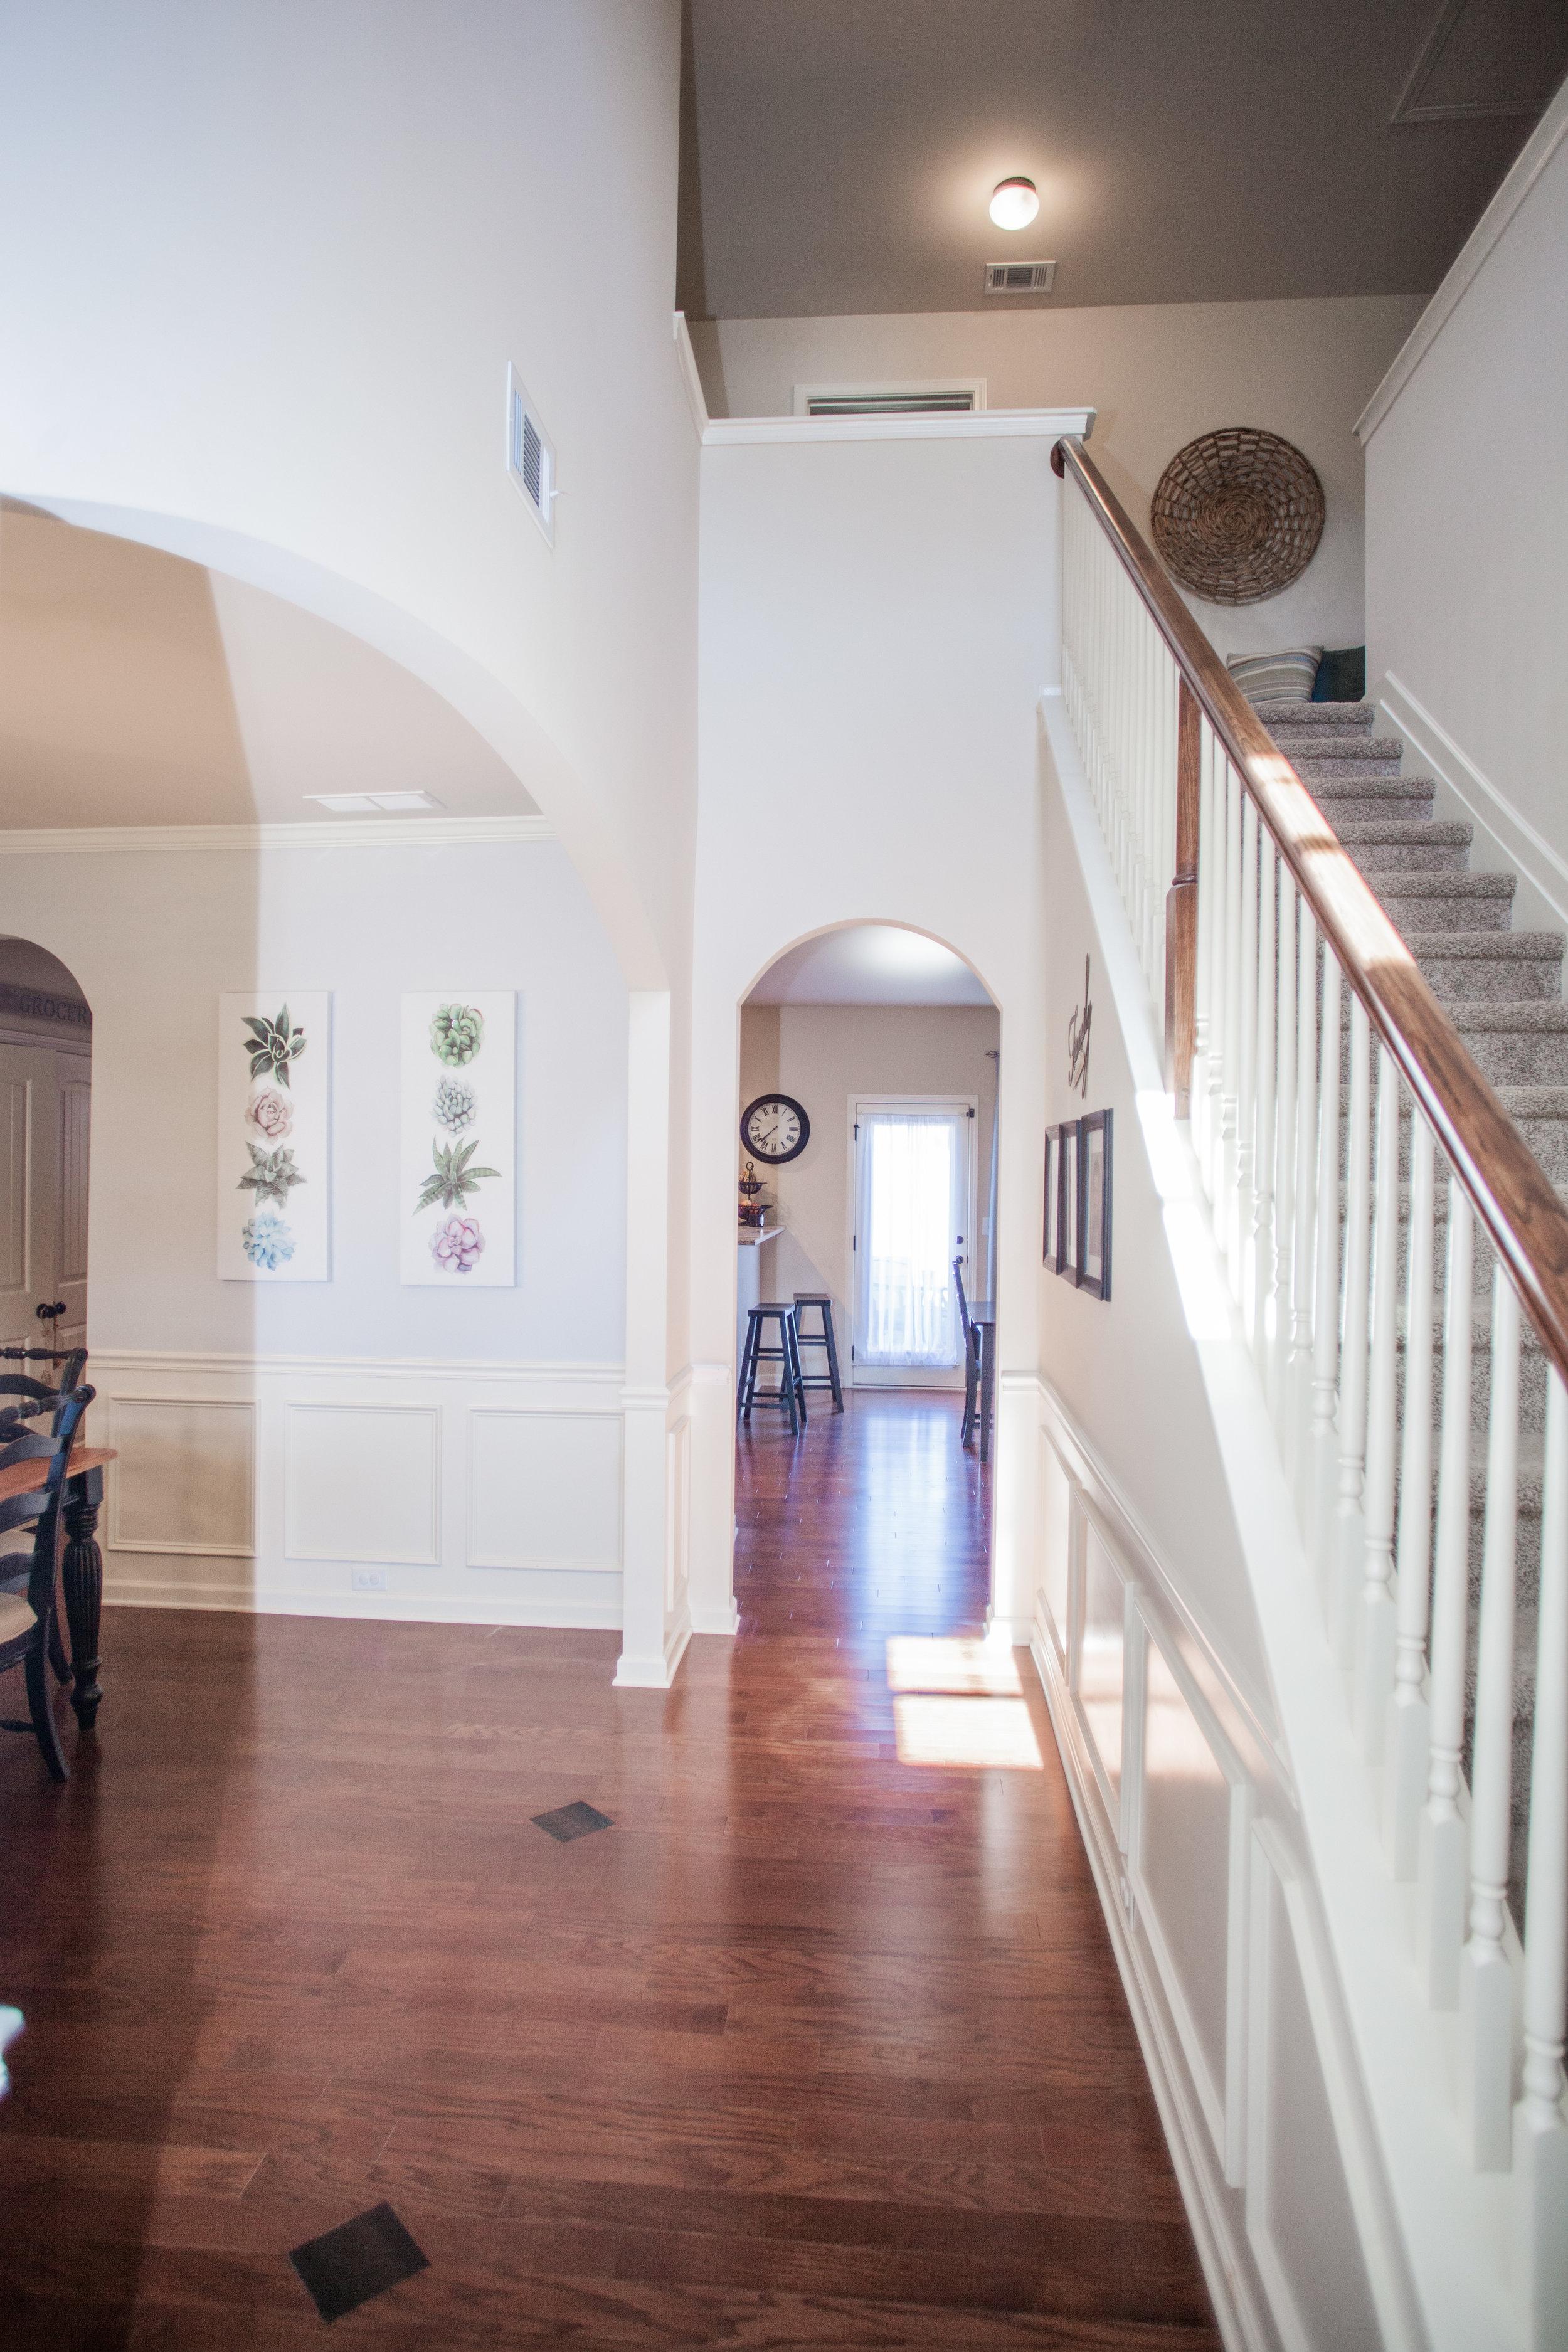 woodstock-ga-house-for-sale-wingard-real-estate-under-300k-32.jpg